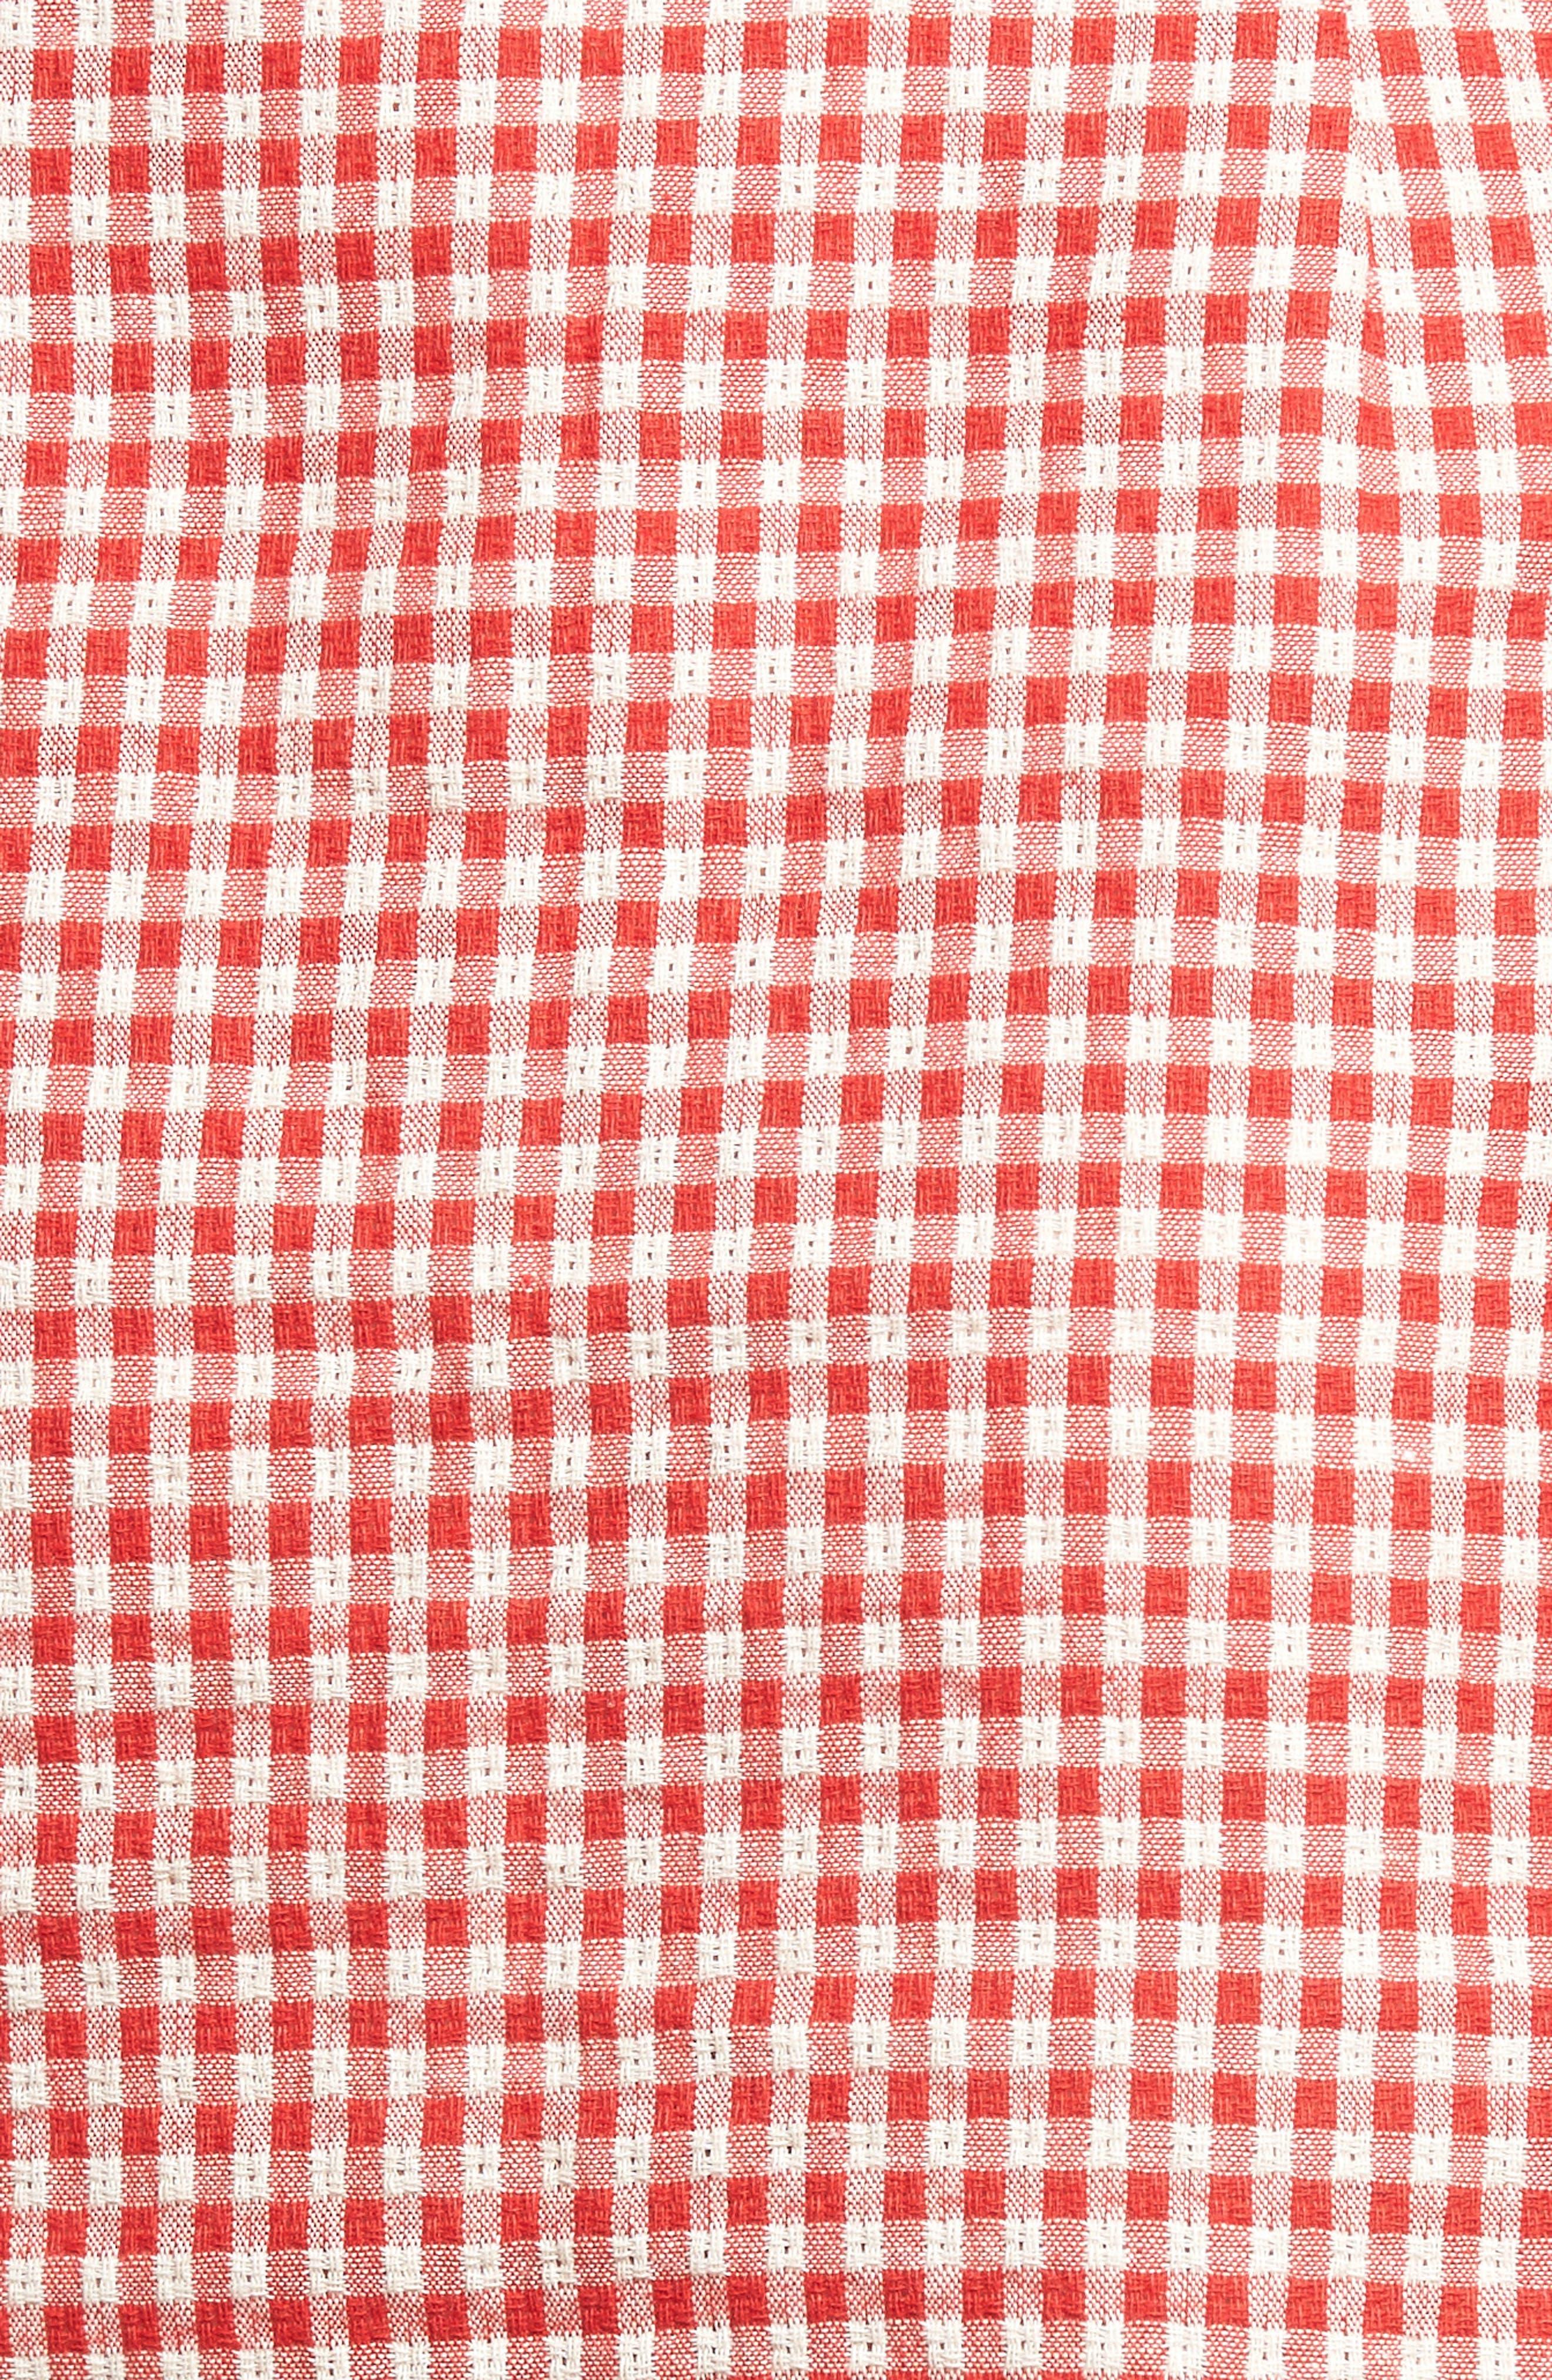 Gingham Ruffle Sleeve Dress,                             Alternate thumbnail 6, color,                             Red Gingham